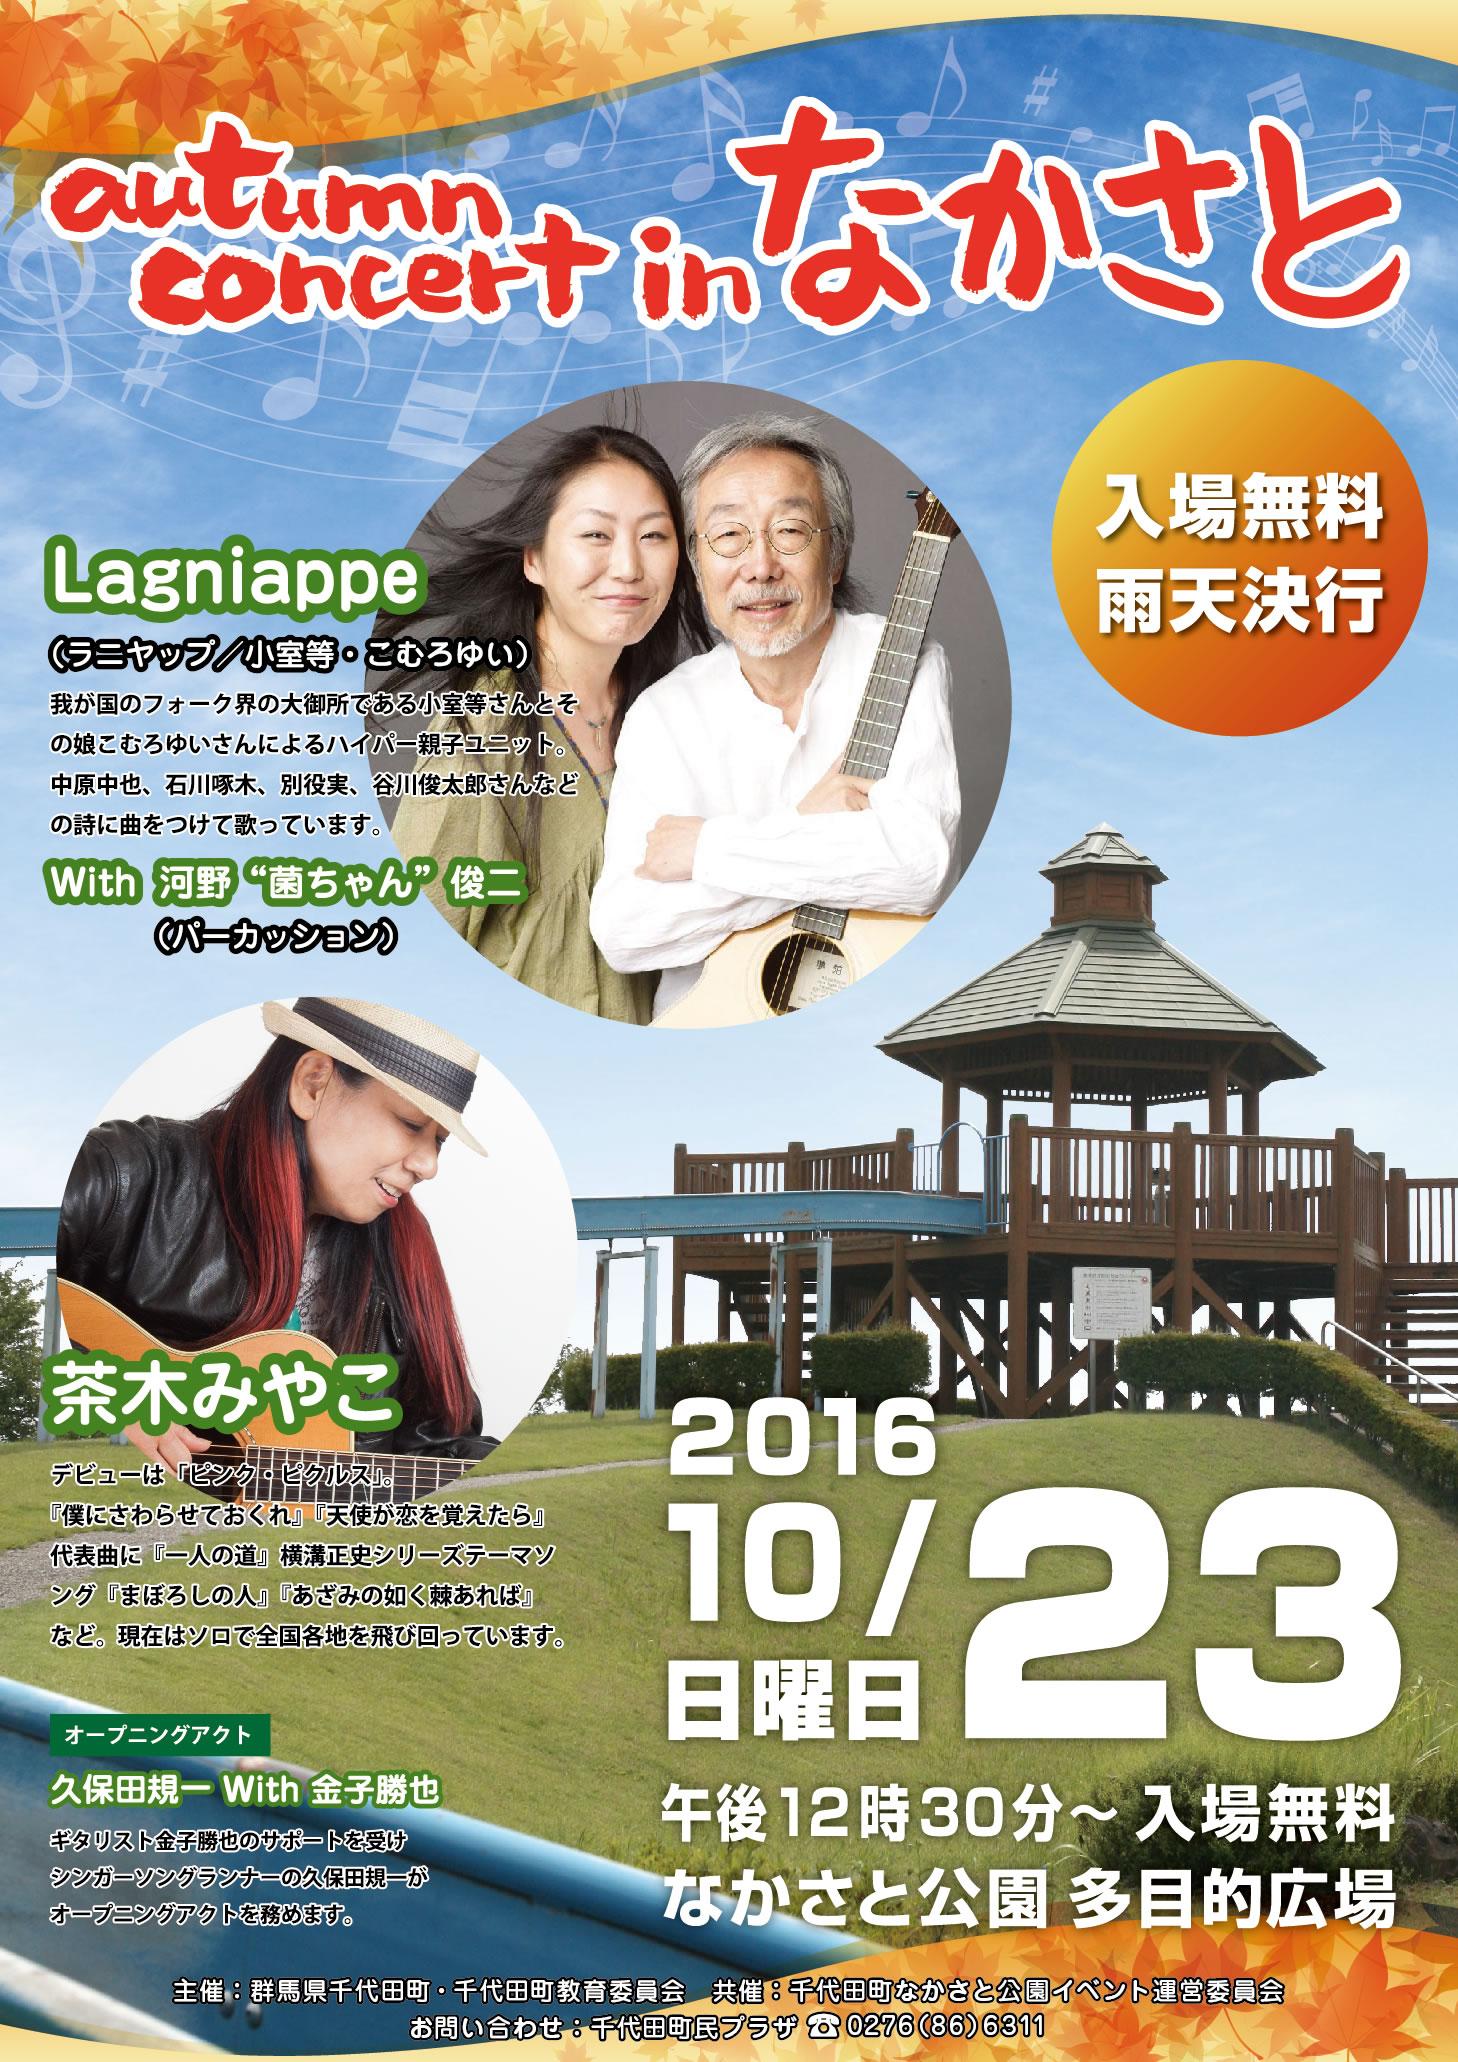 1023茶木2016_10_23